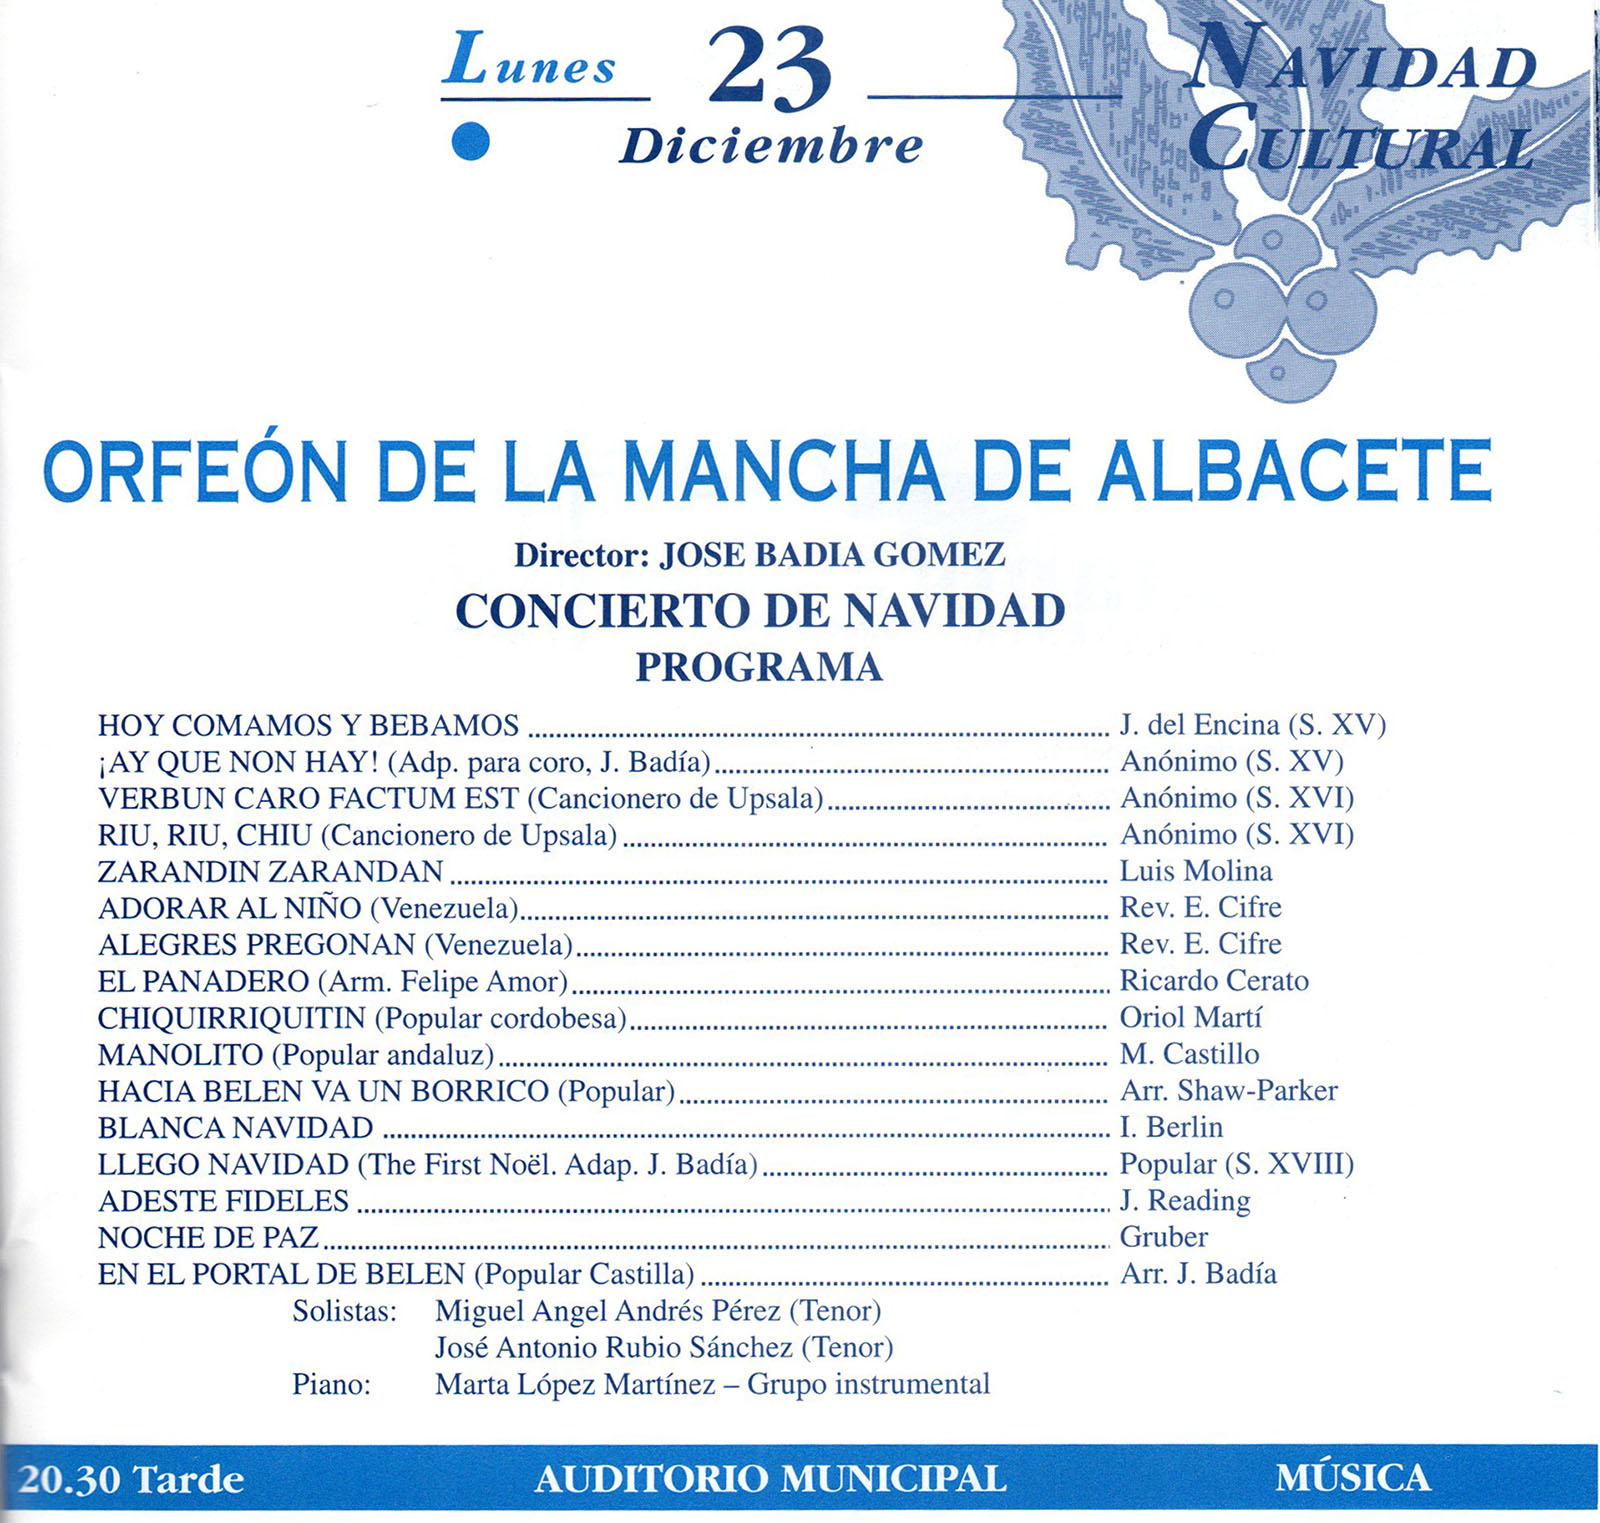 1996-DIC-Albacete